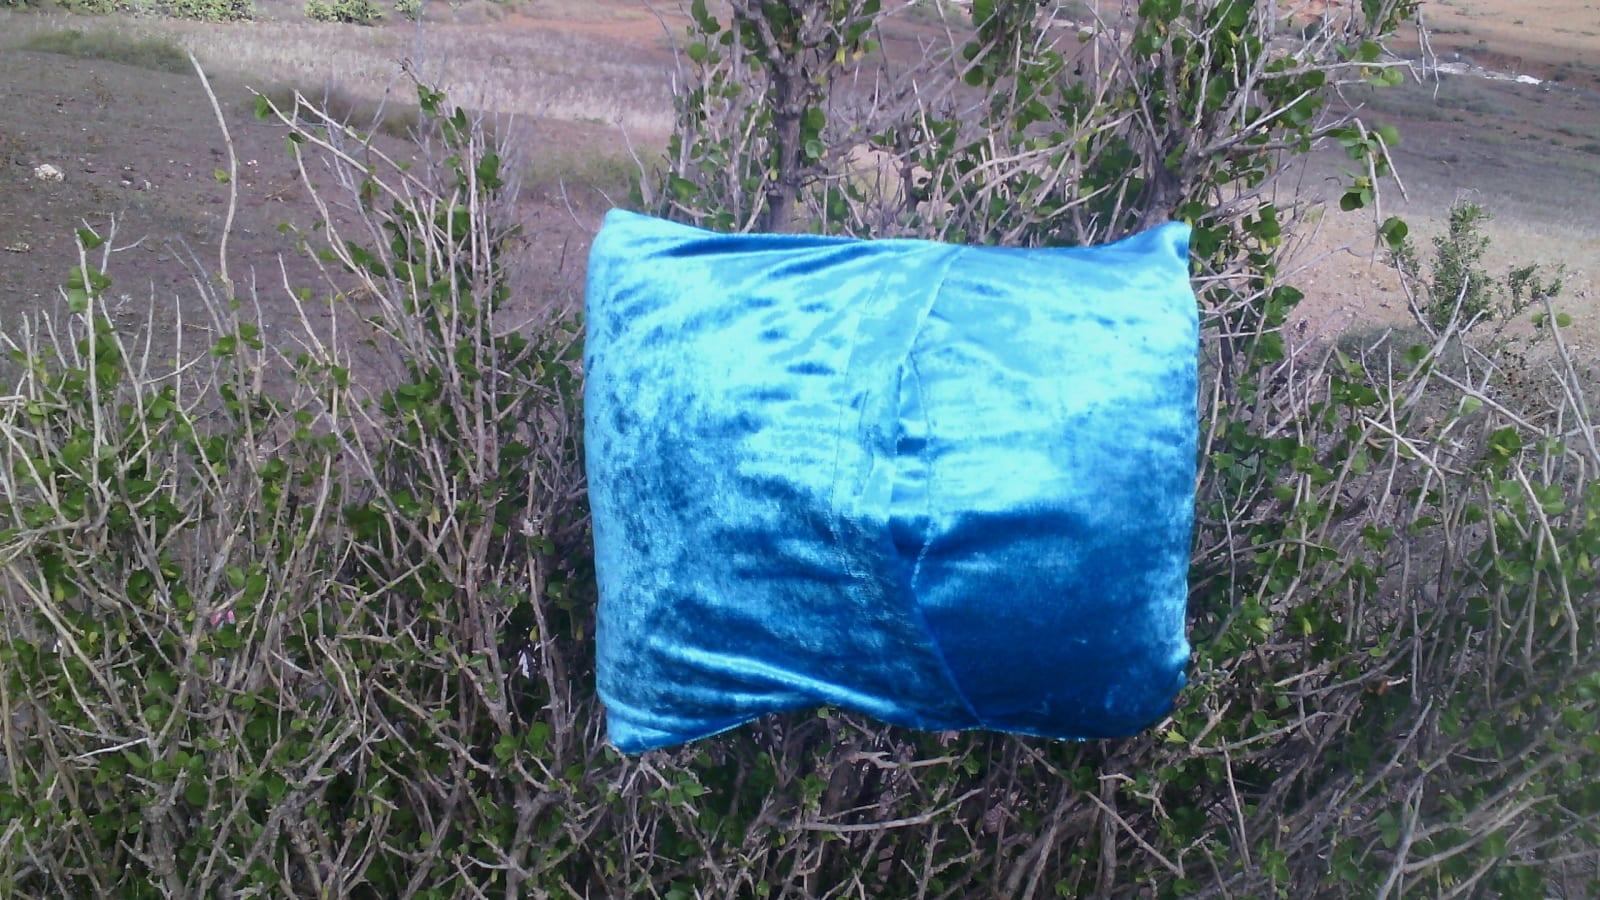 pillow Almbra and super glue Blue, Grey Morocco